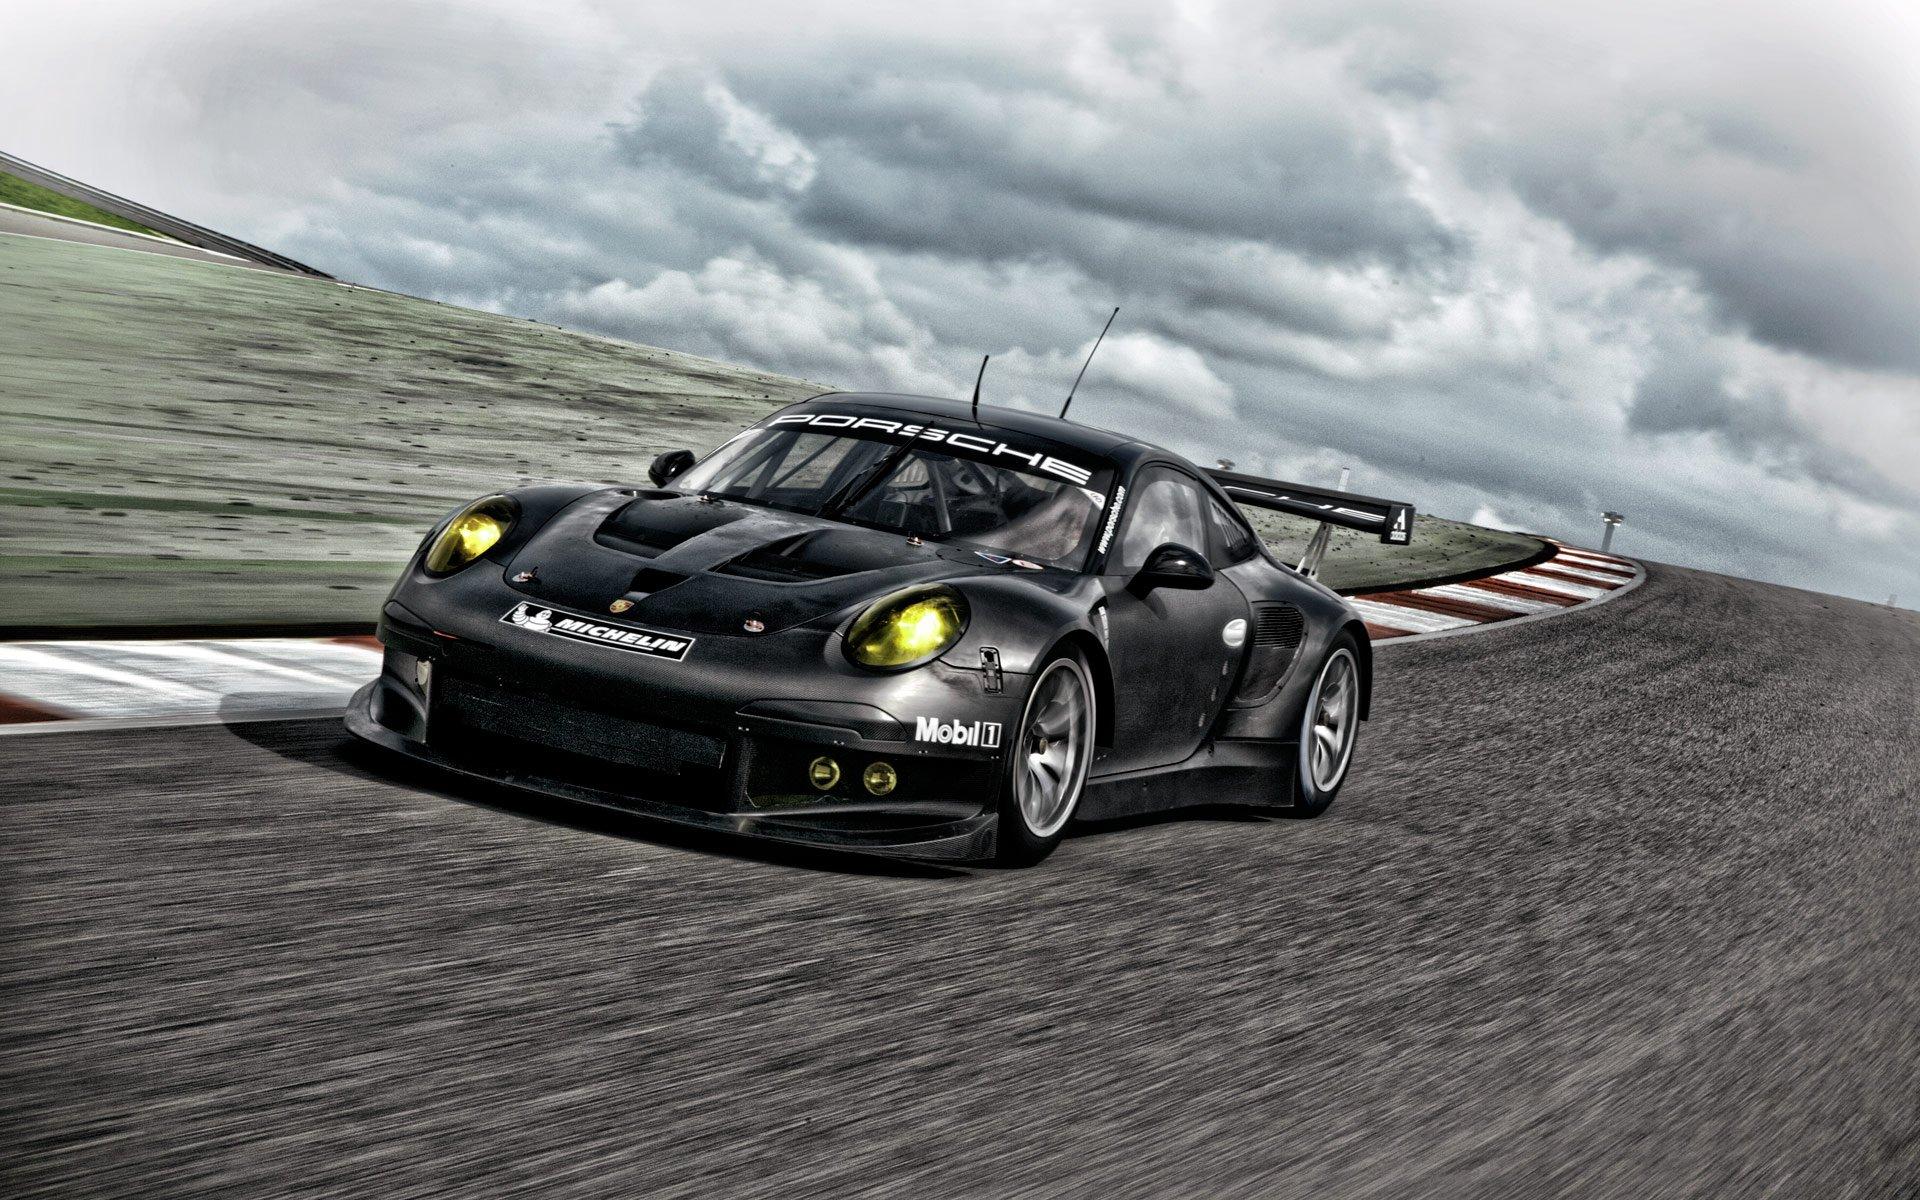 Porsche 911 Rsr Video Celebrates 50th Anniversary Photos